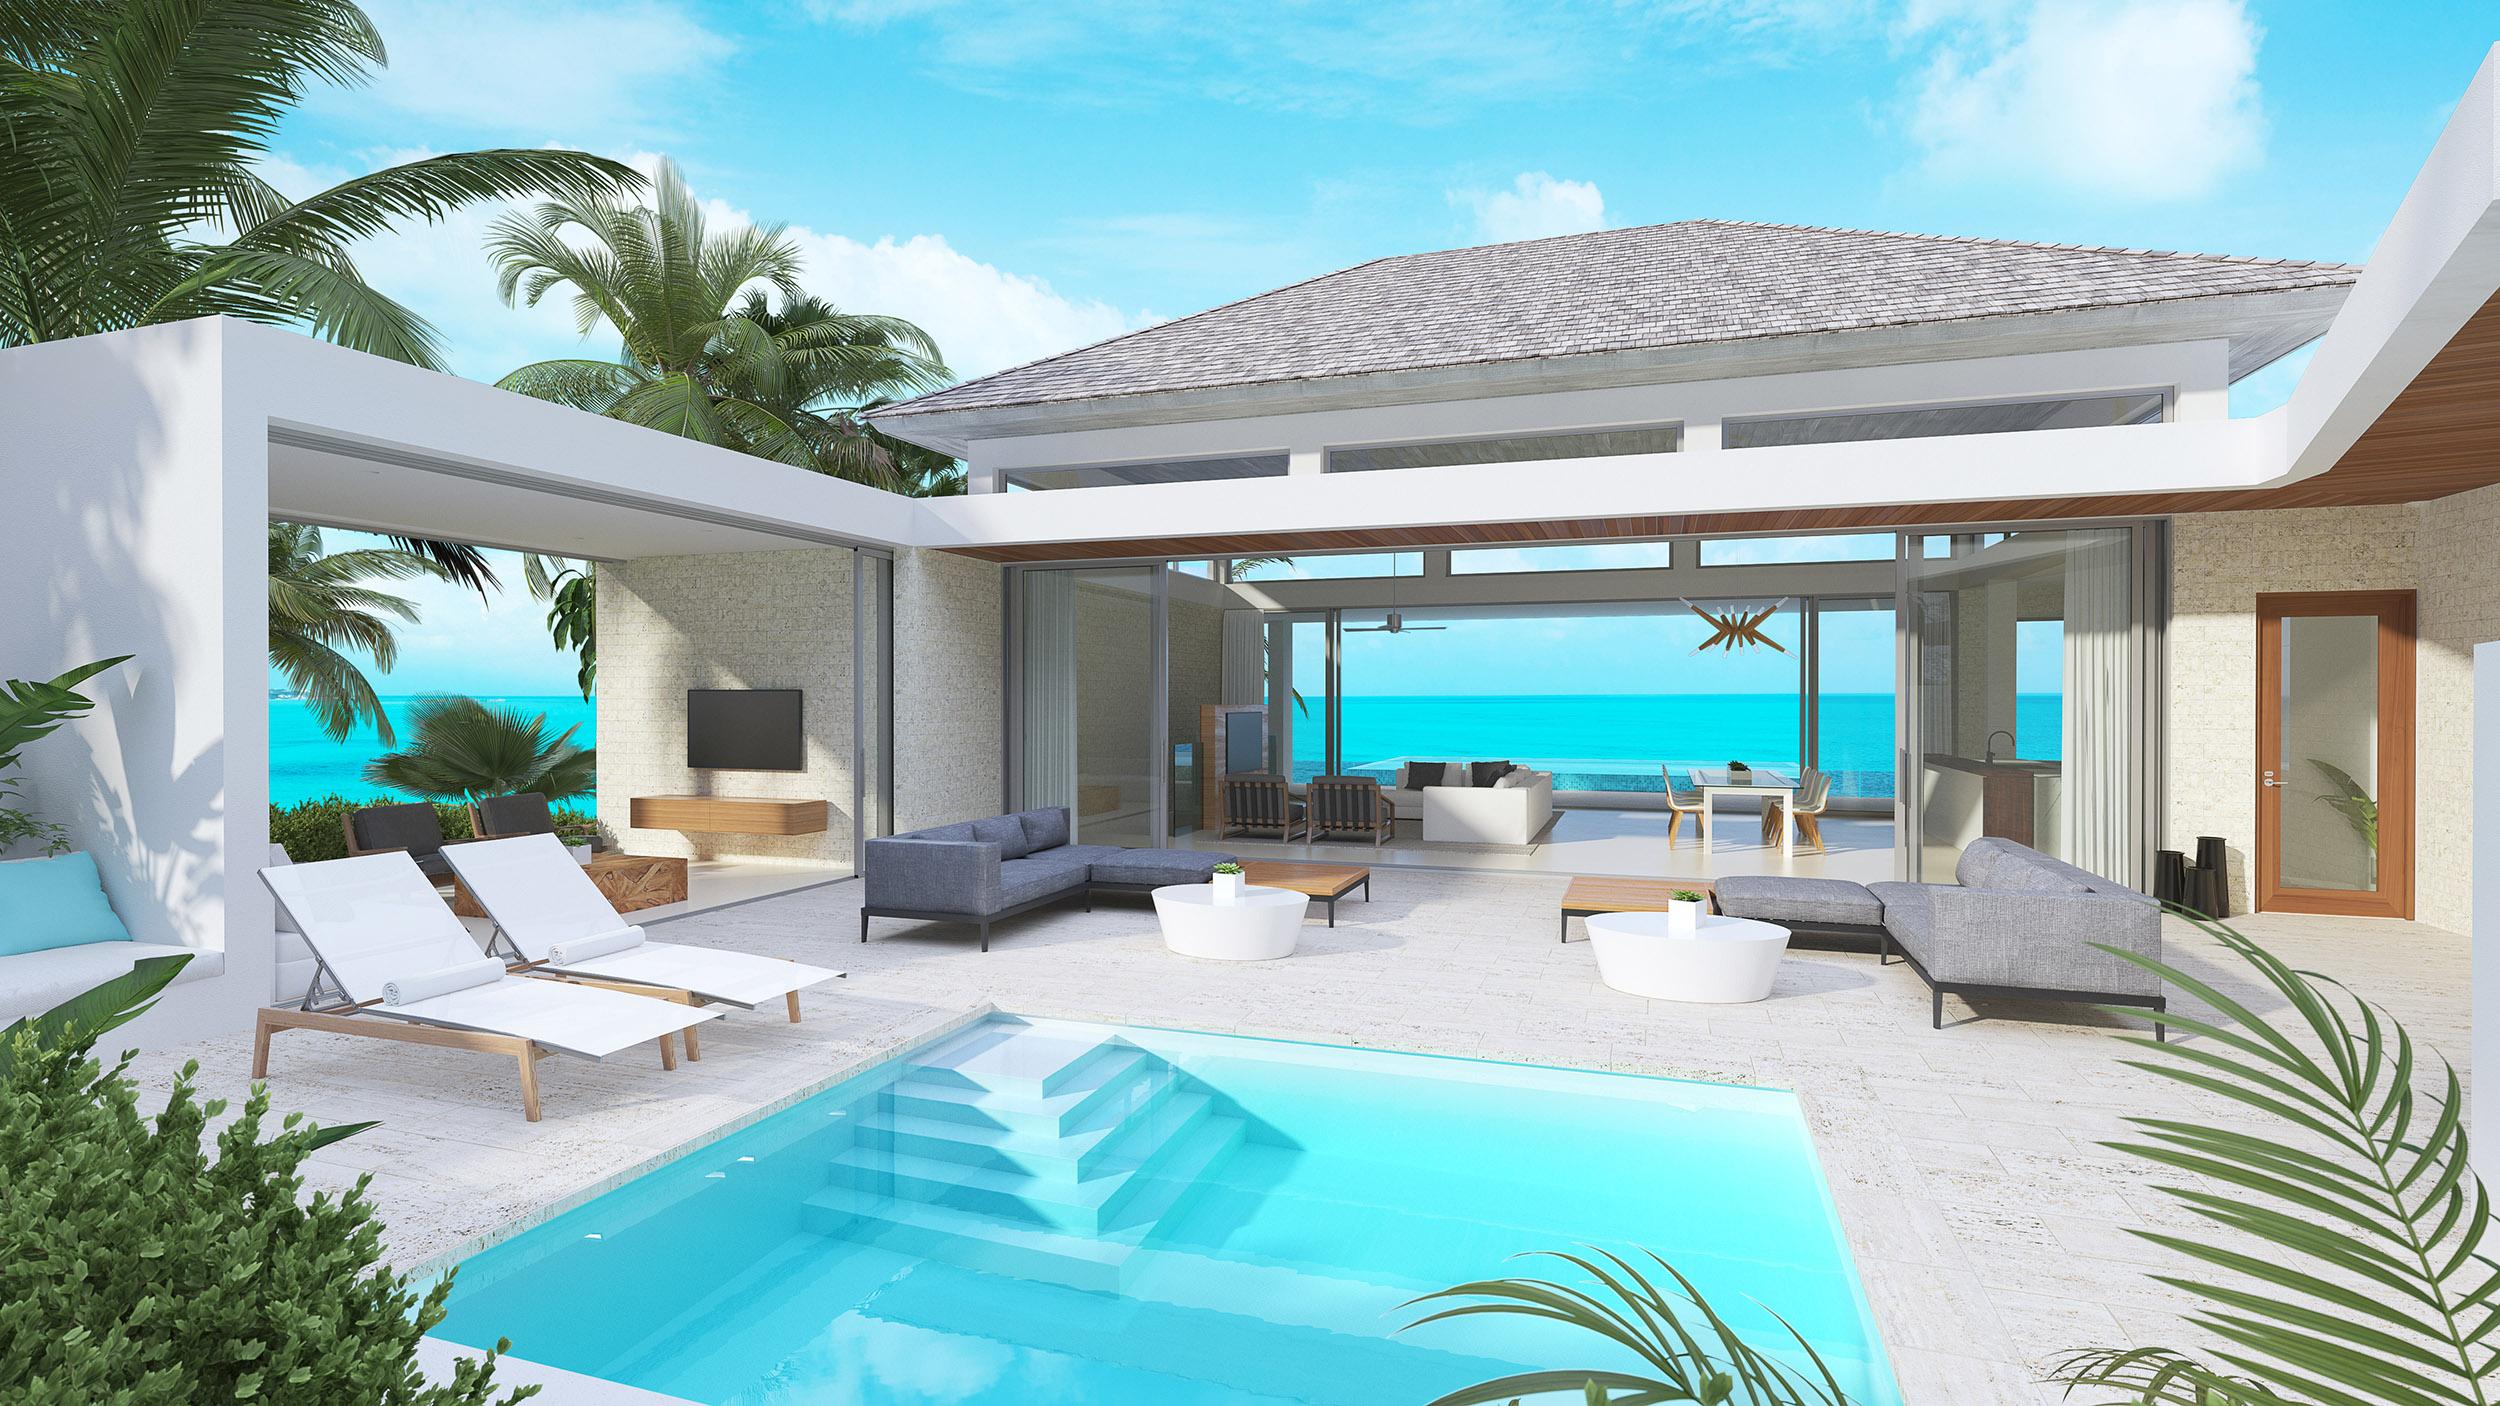 Wymara Villas - computer rendered view of the phase 2 villa courtyard pool